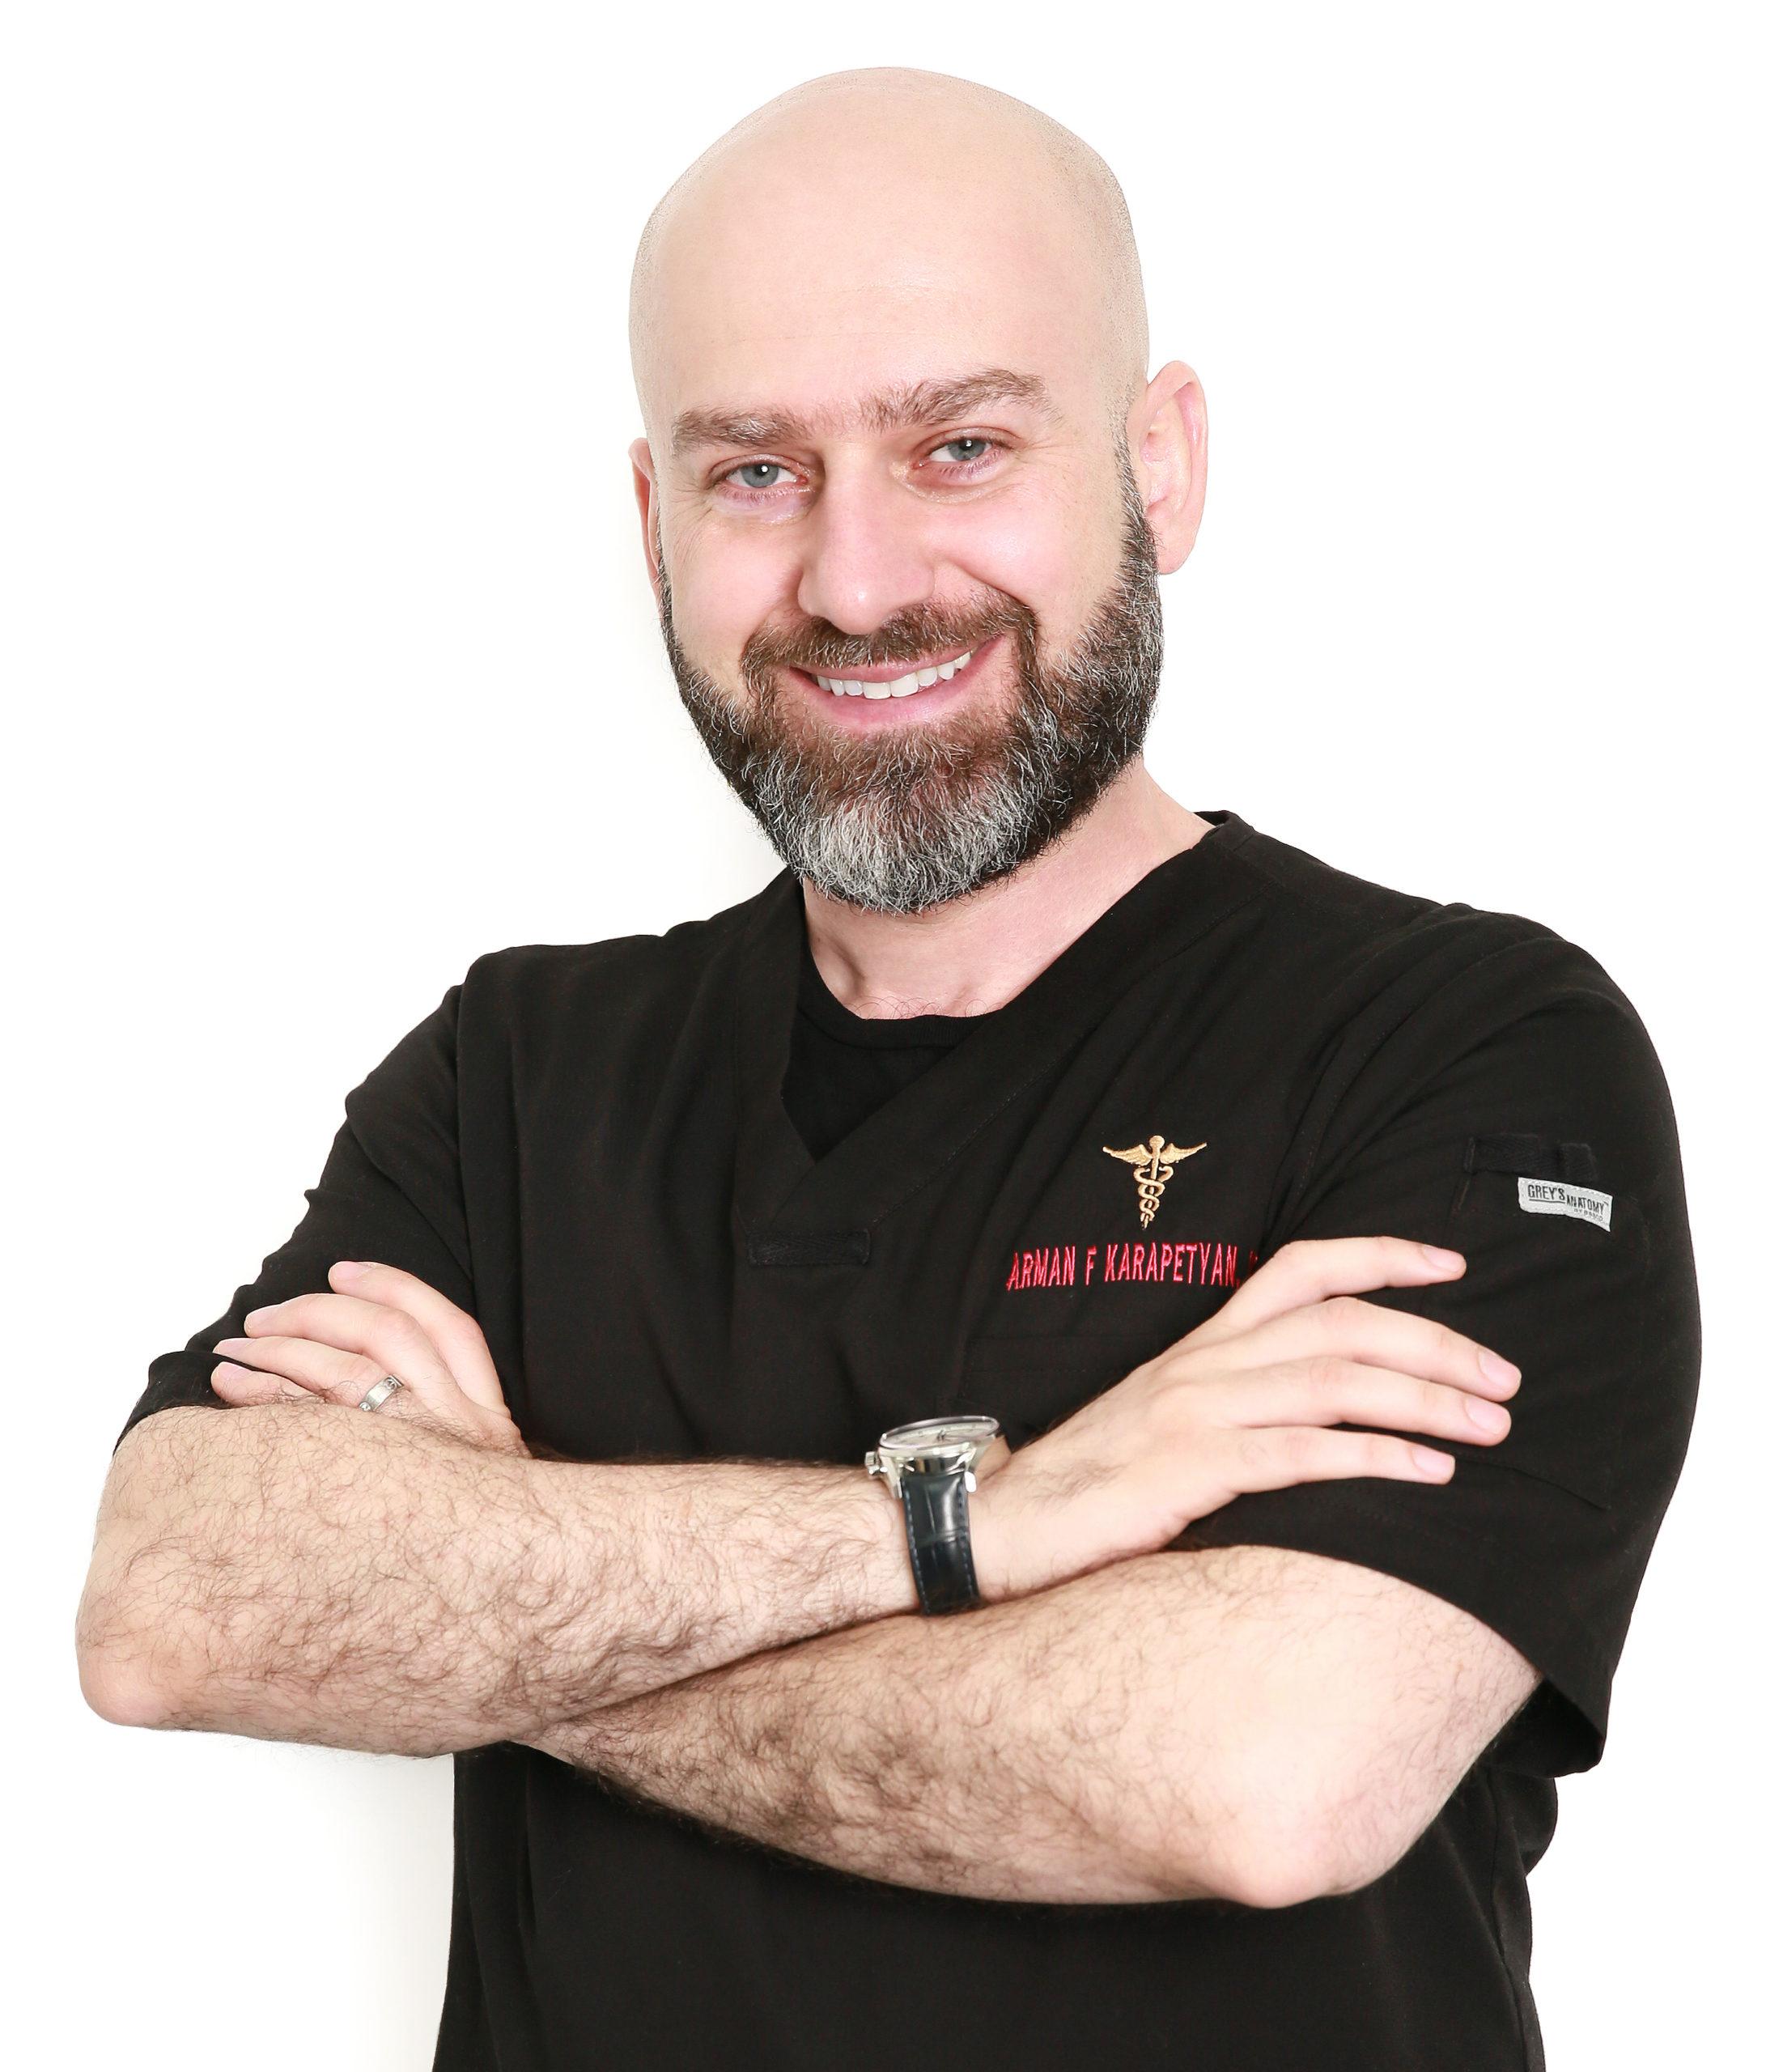 Arman F. Karapetyan